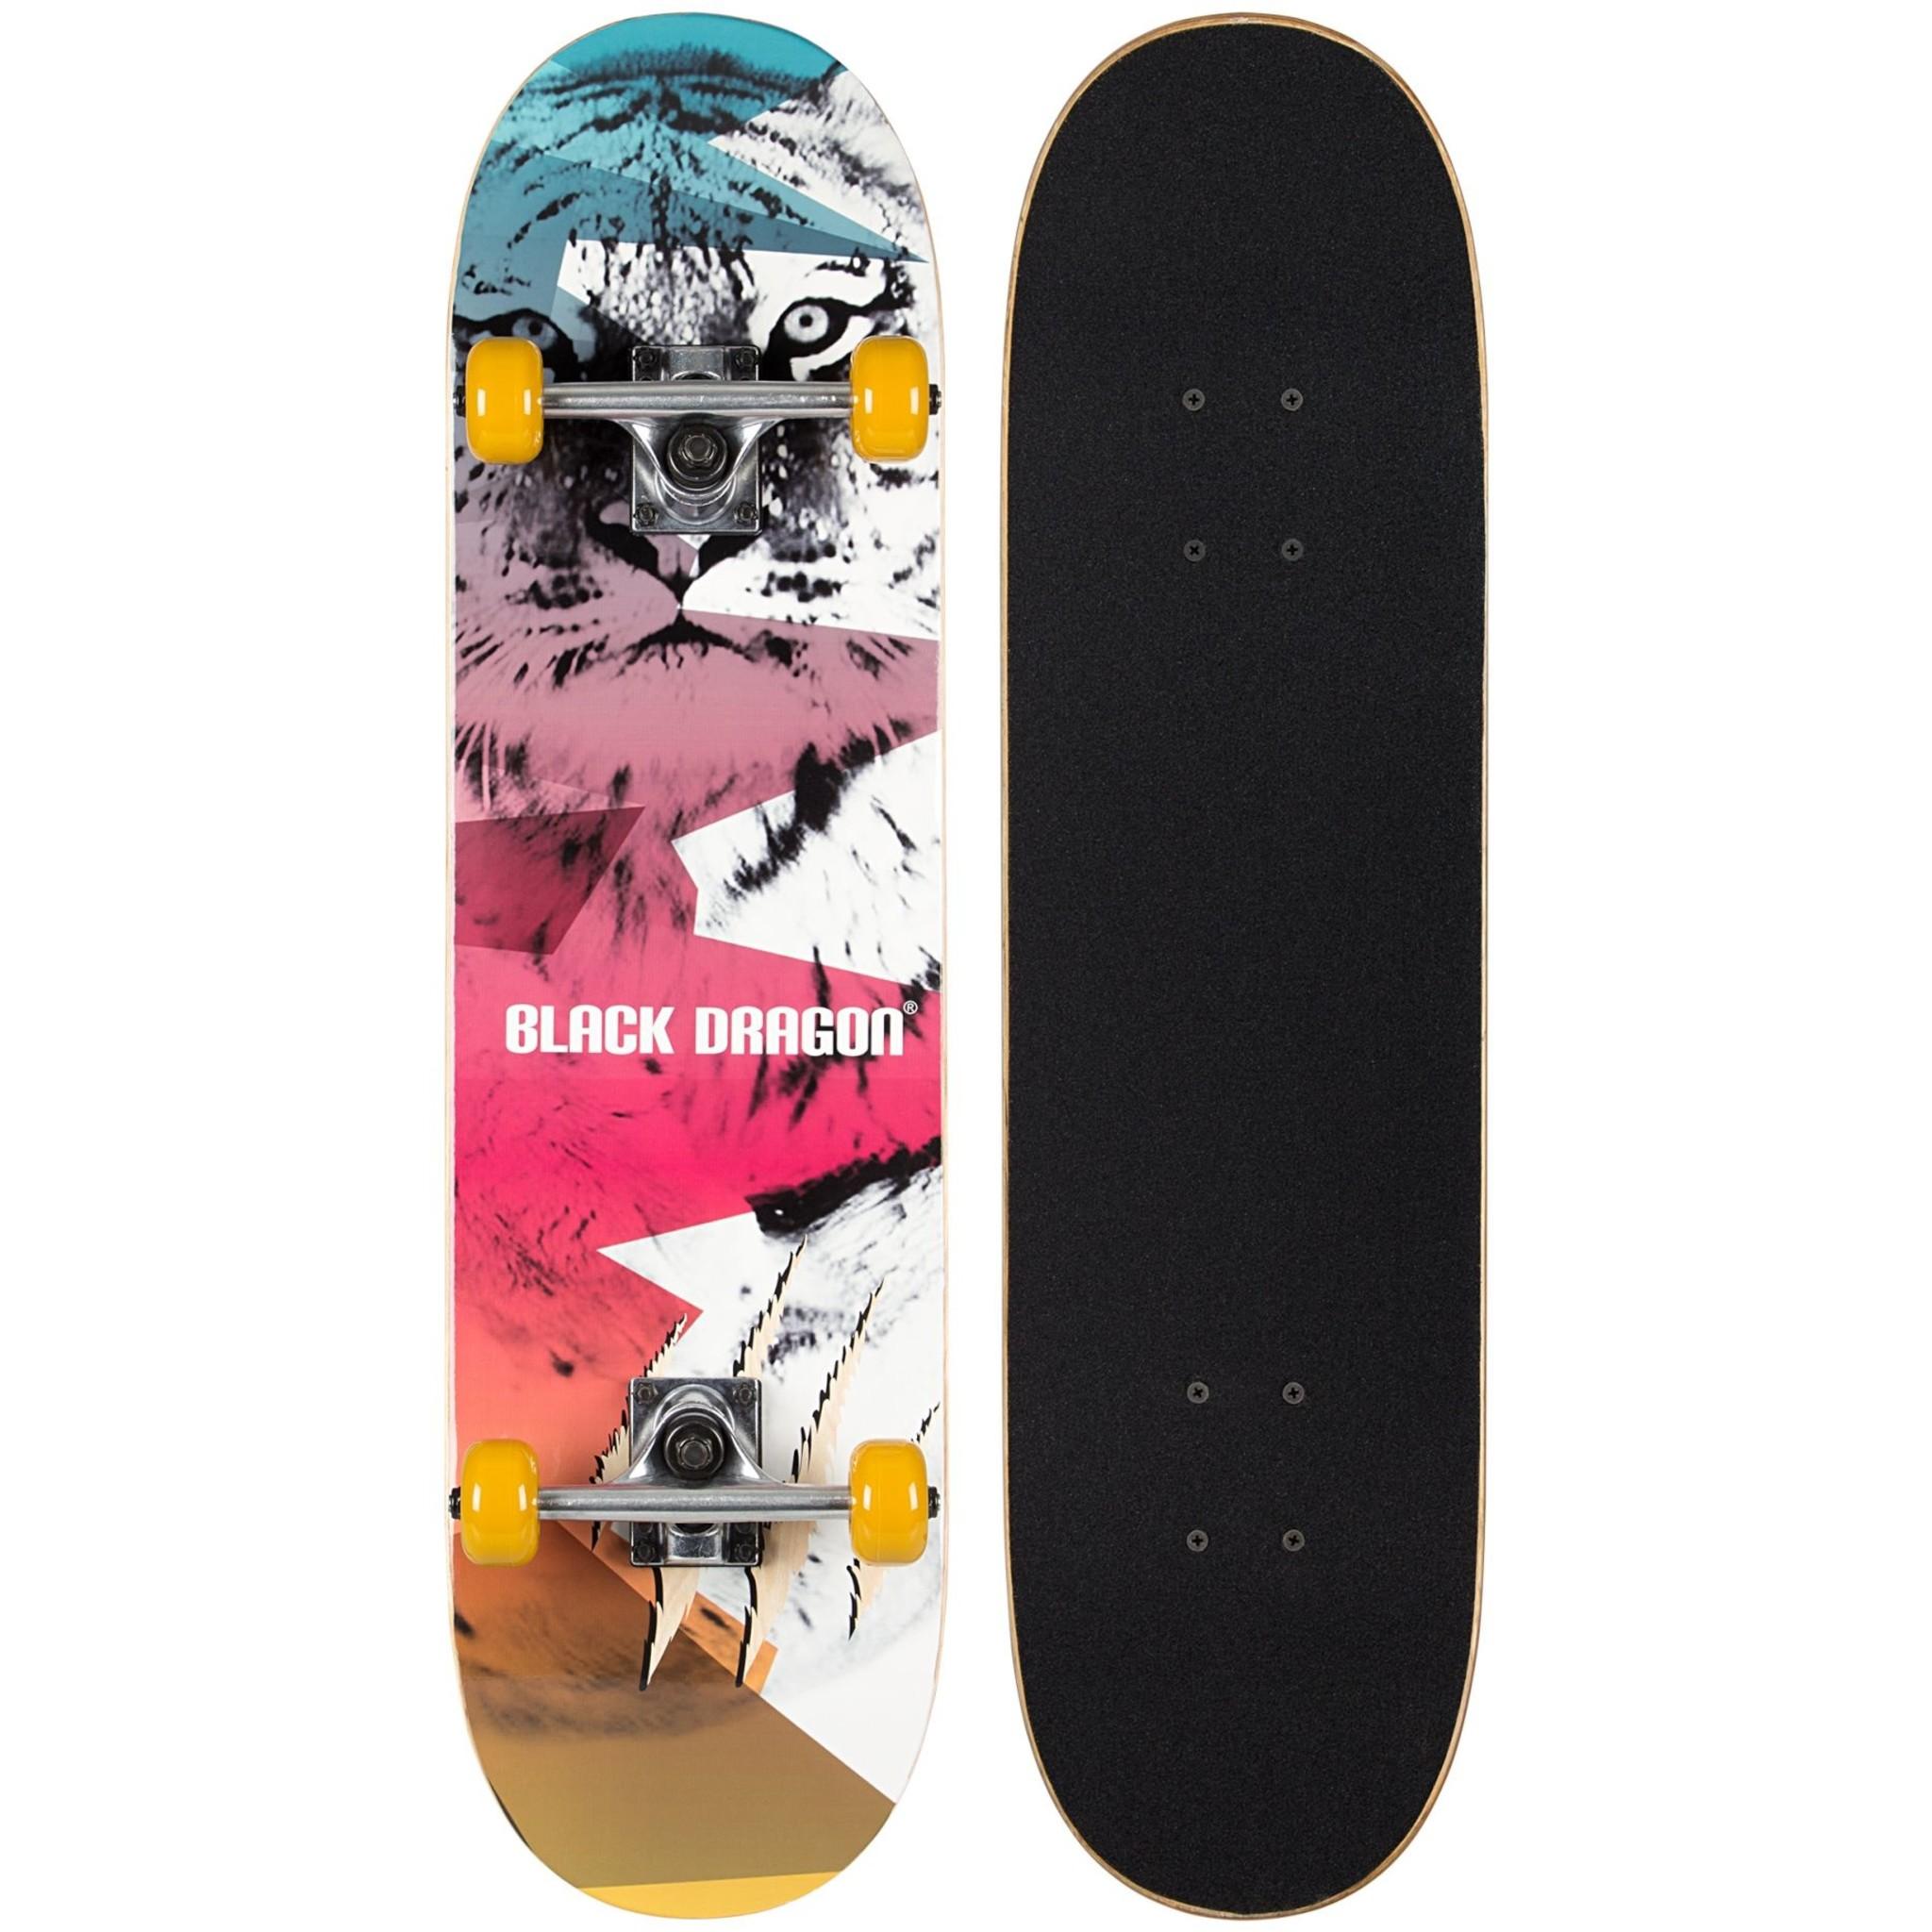 Black Dragon® Skateboard Street Natives - WGF